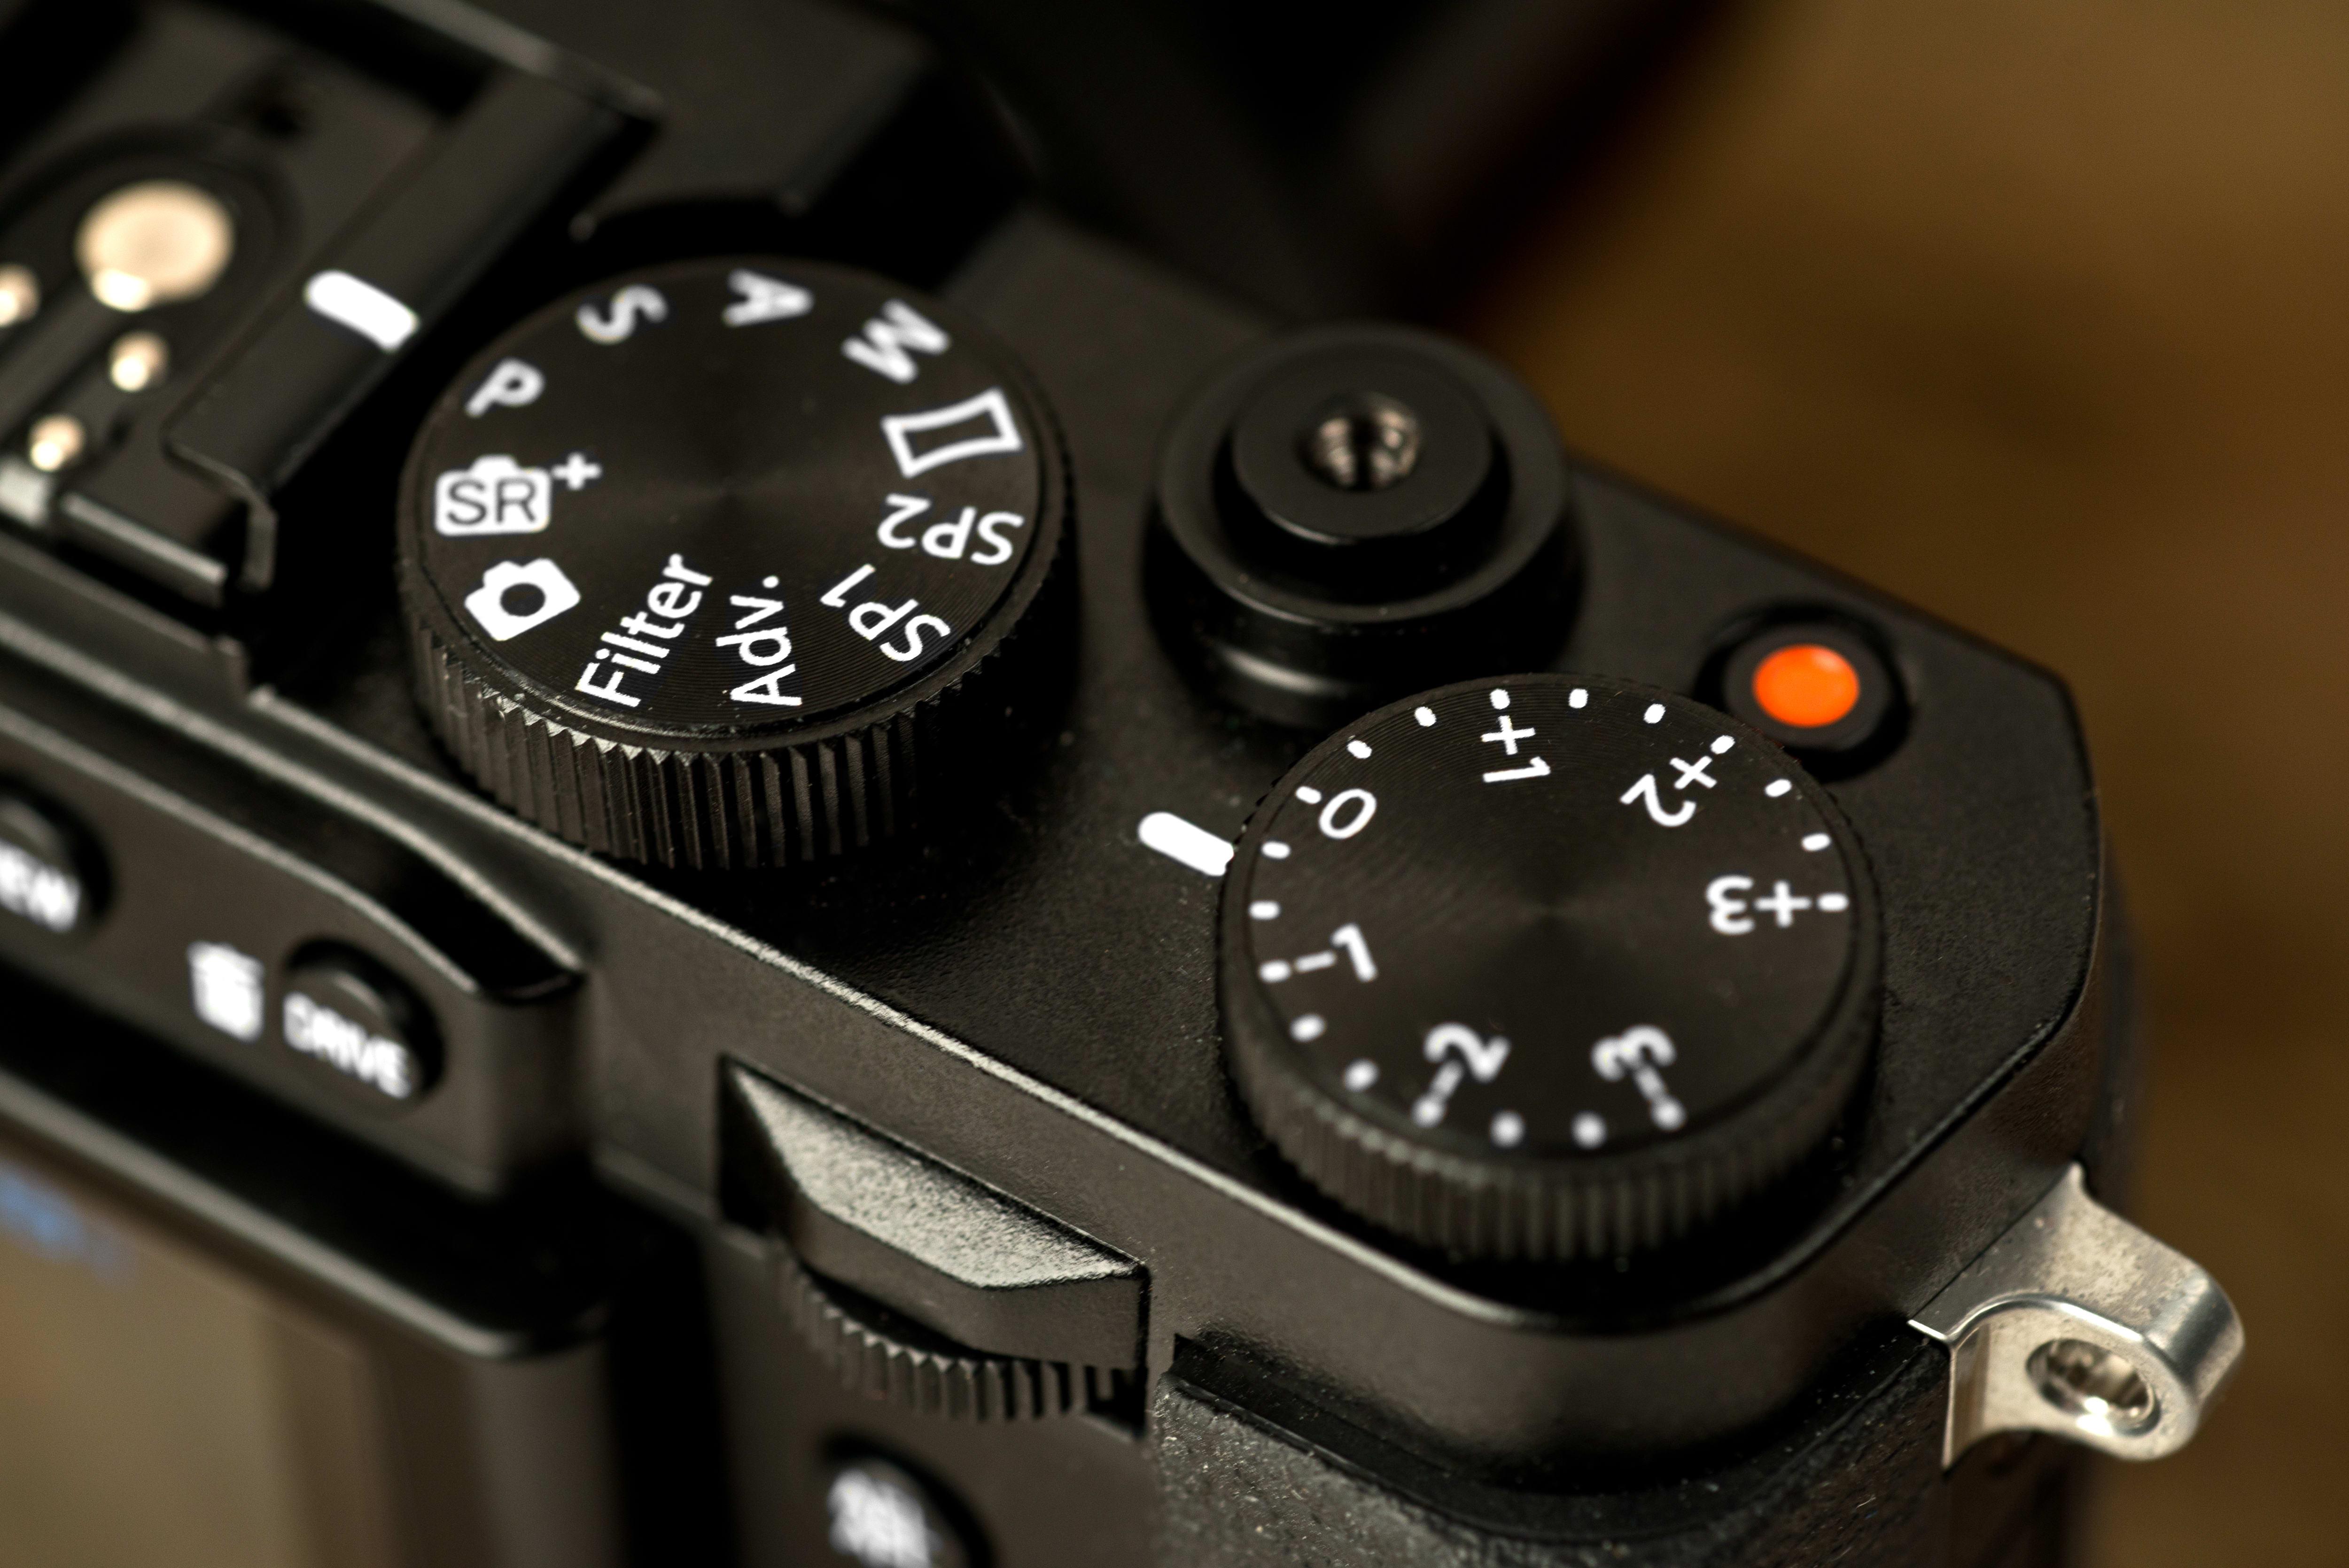 A photo of the Fujifilm X30's top controls.